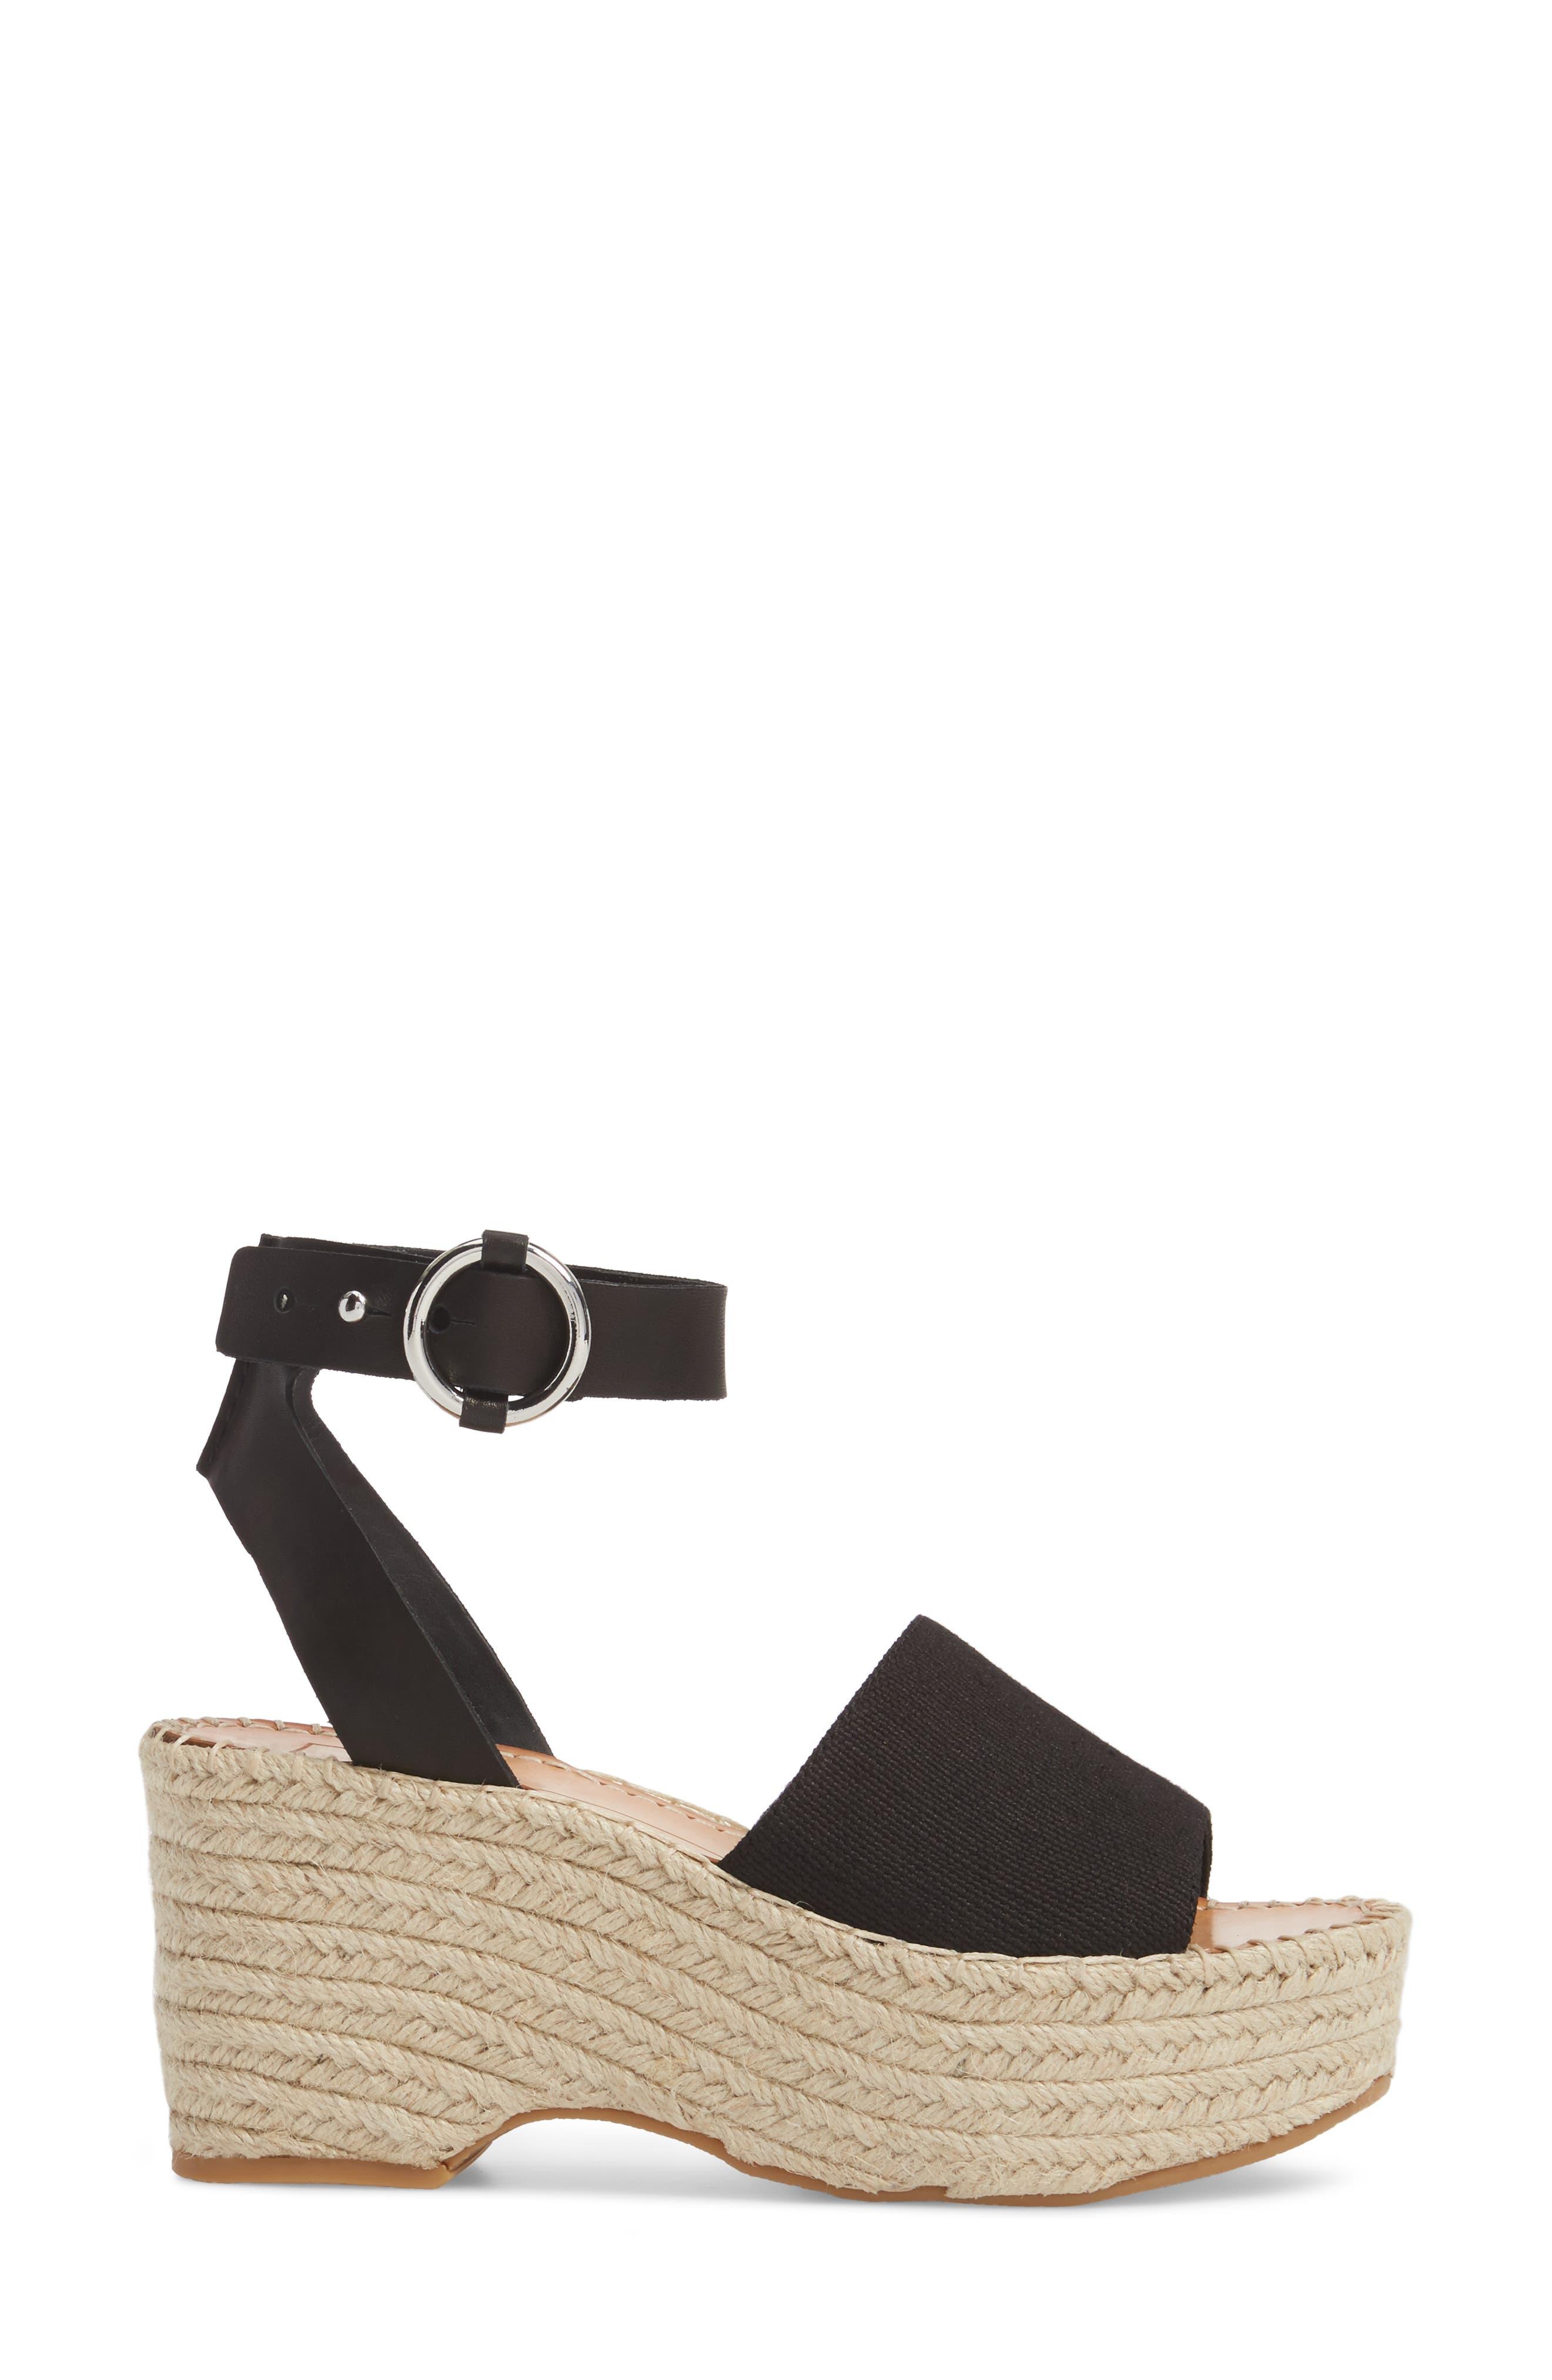 DOLCE VITA, Lesly Espadrille Platform Sandal, Alternate thumbnail 3, color, 001